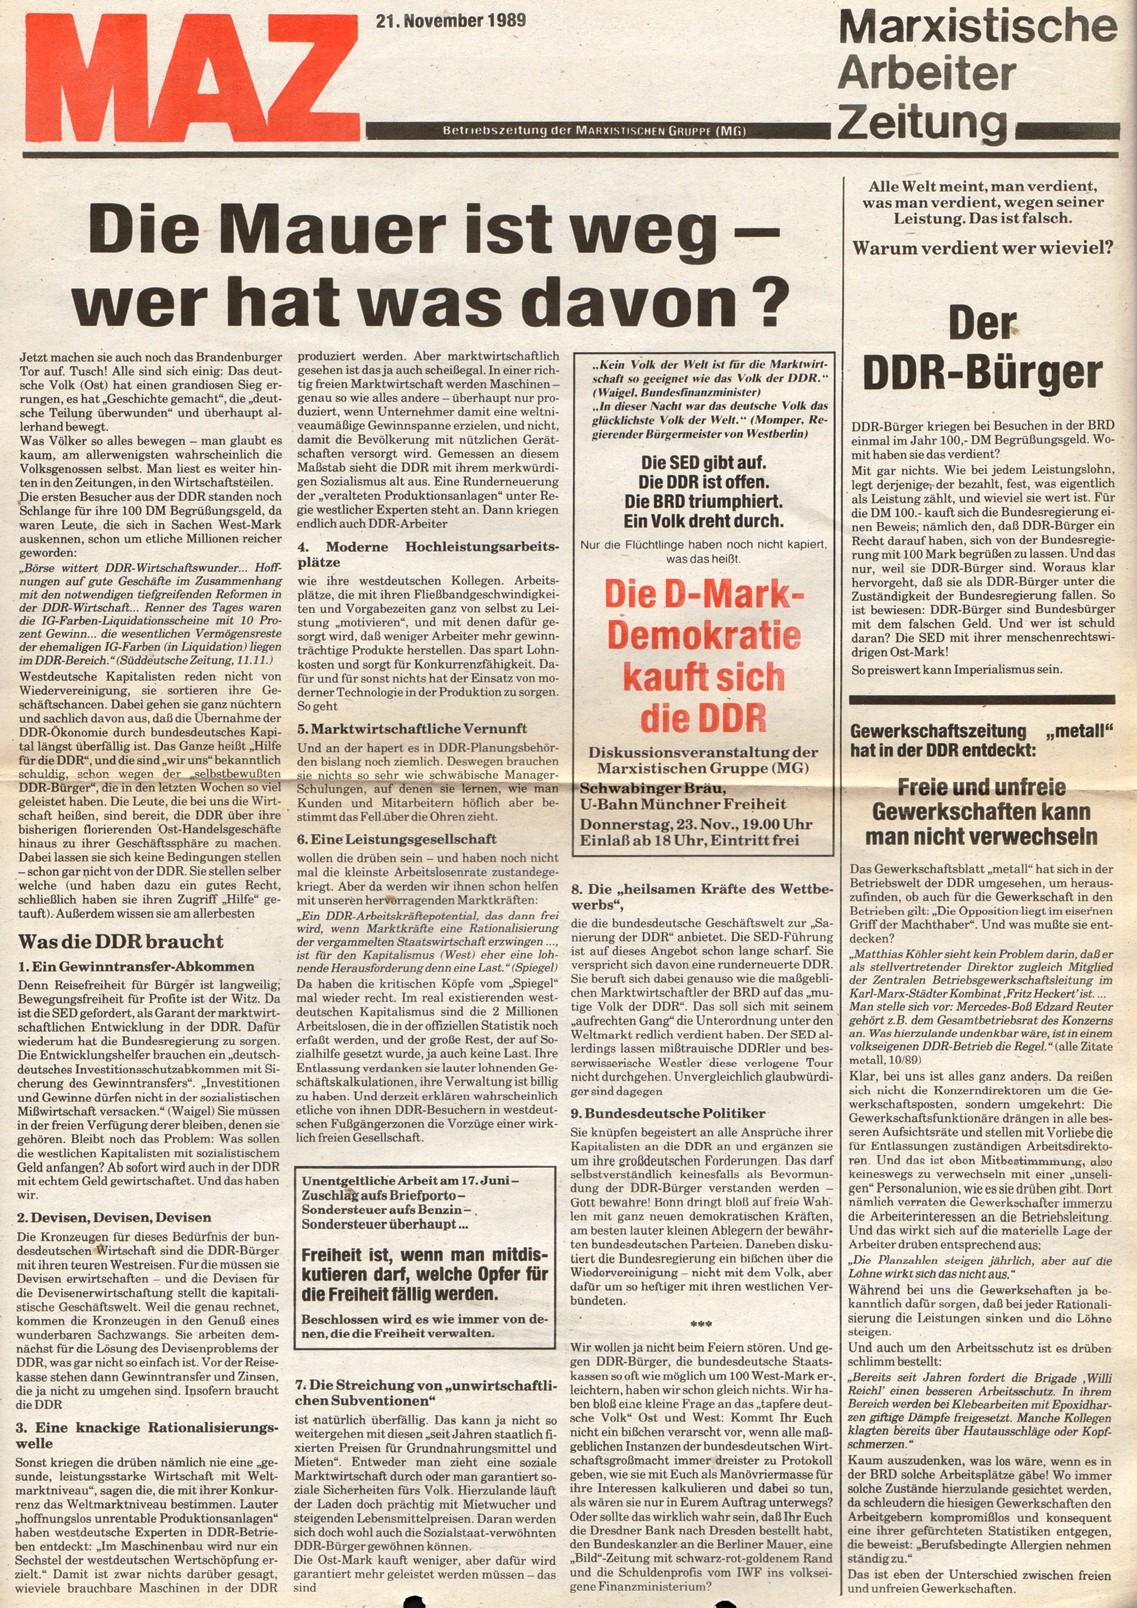 Muenchen_MG_MAZ_19891121_01